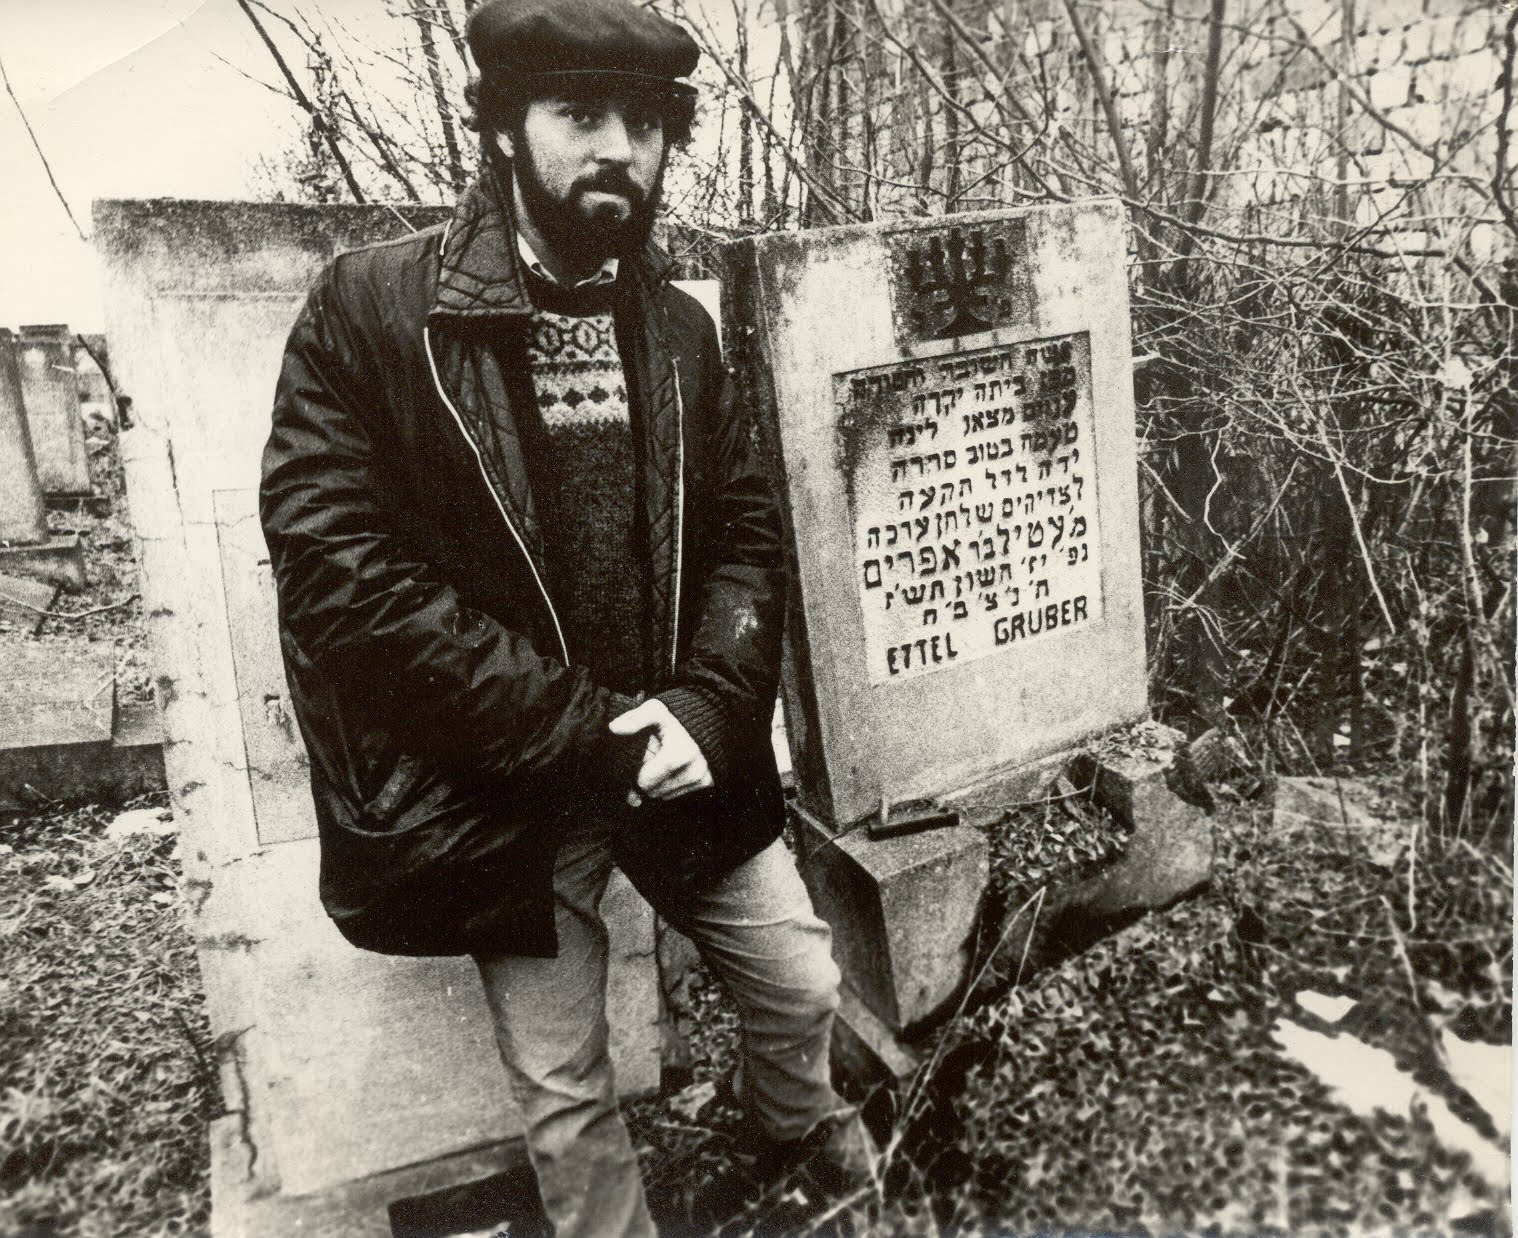 [Sam_Gruber_at_Radauti_Cemetery_1978.jpg]